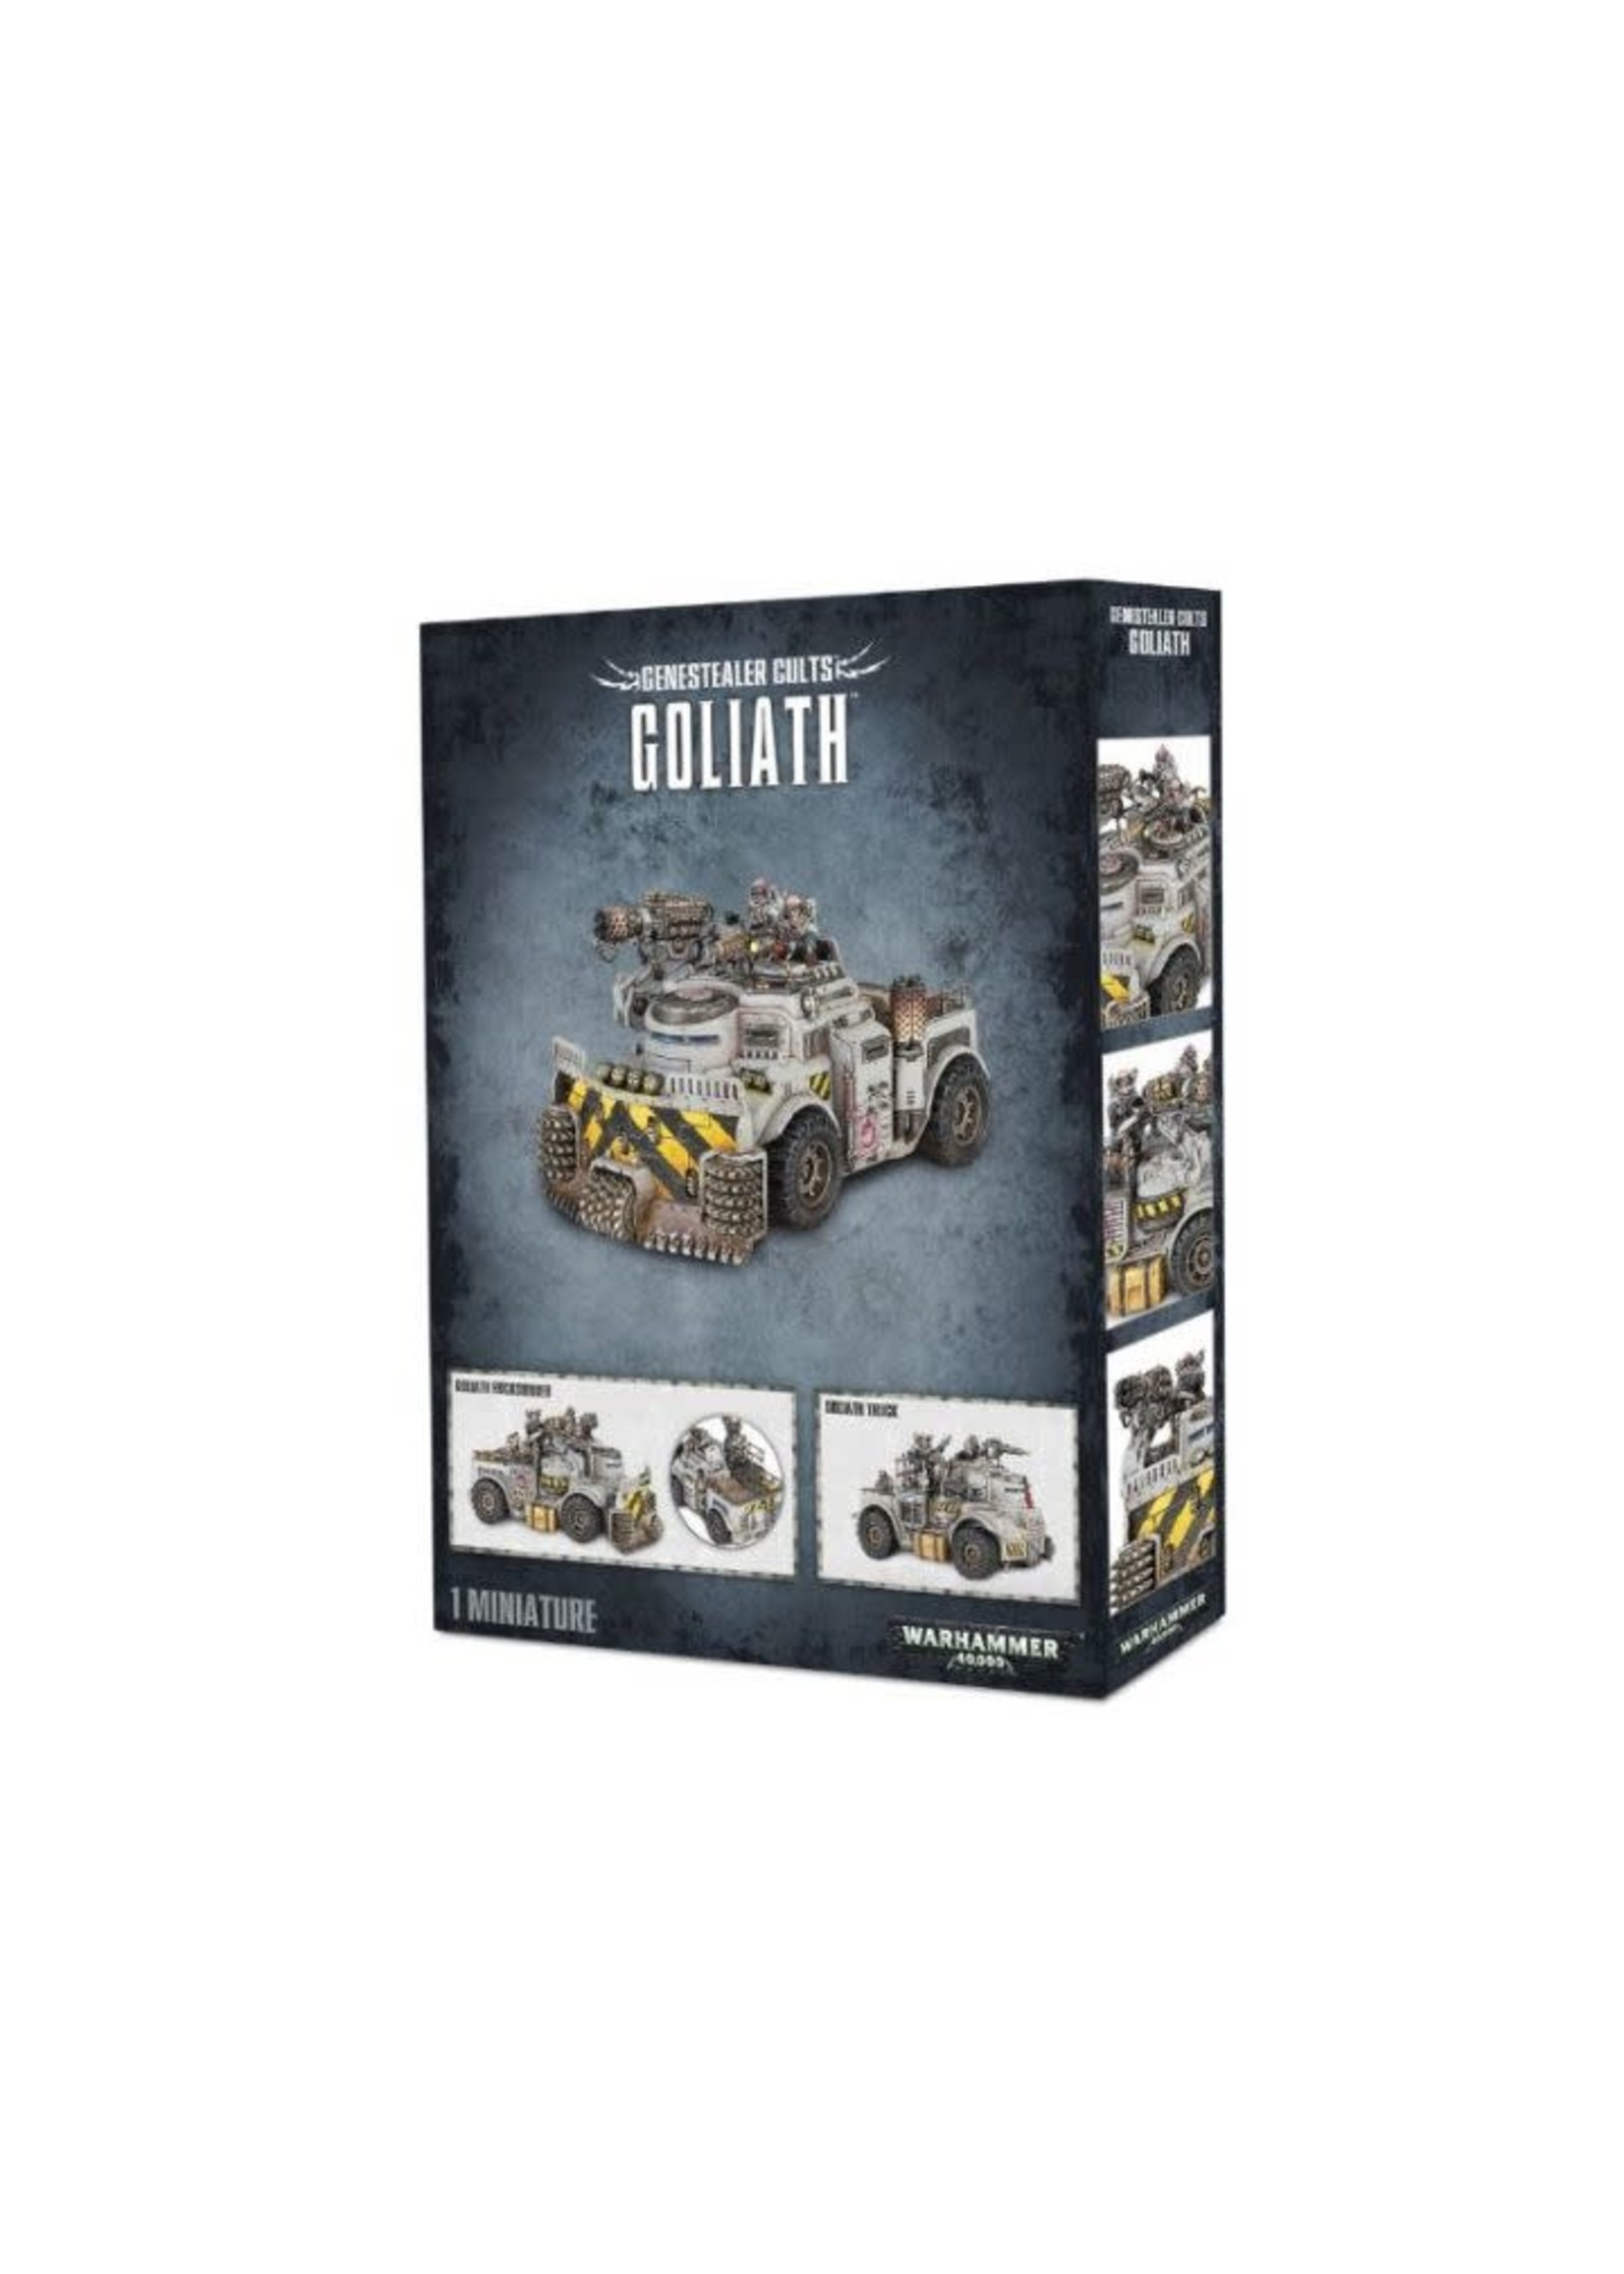 Genestealer Cult: Goliath